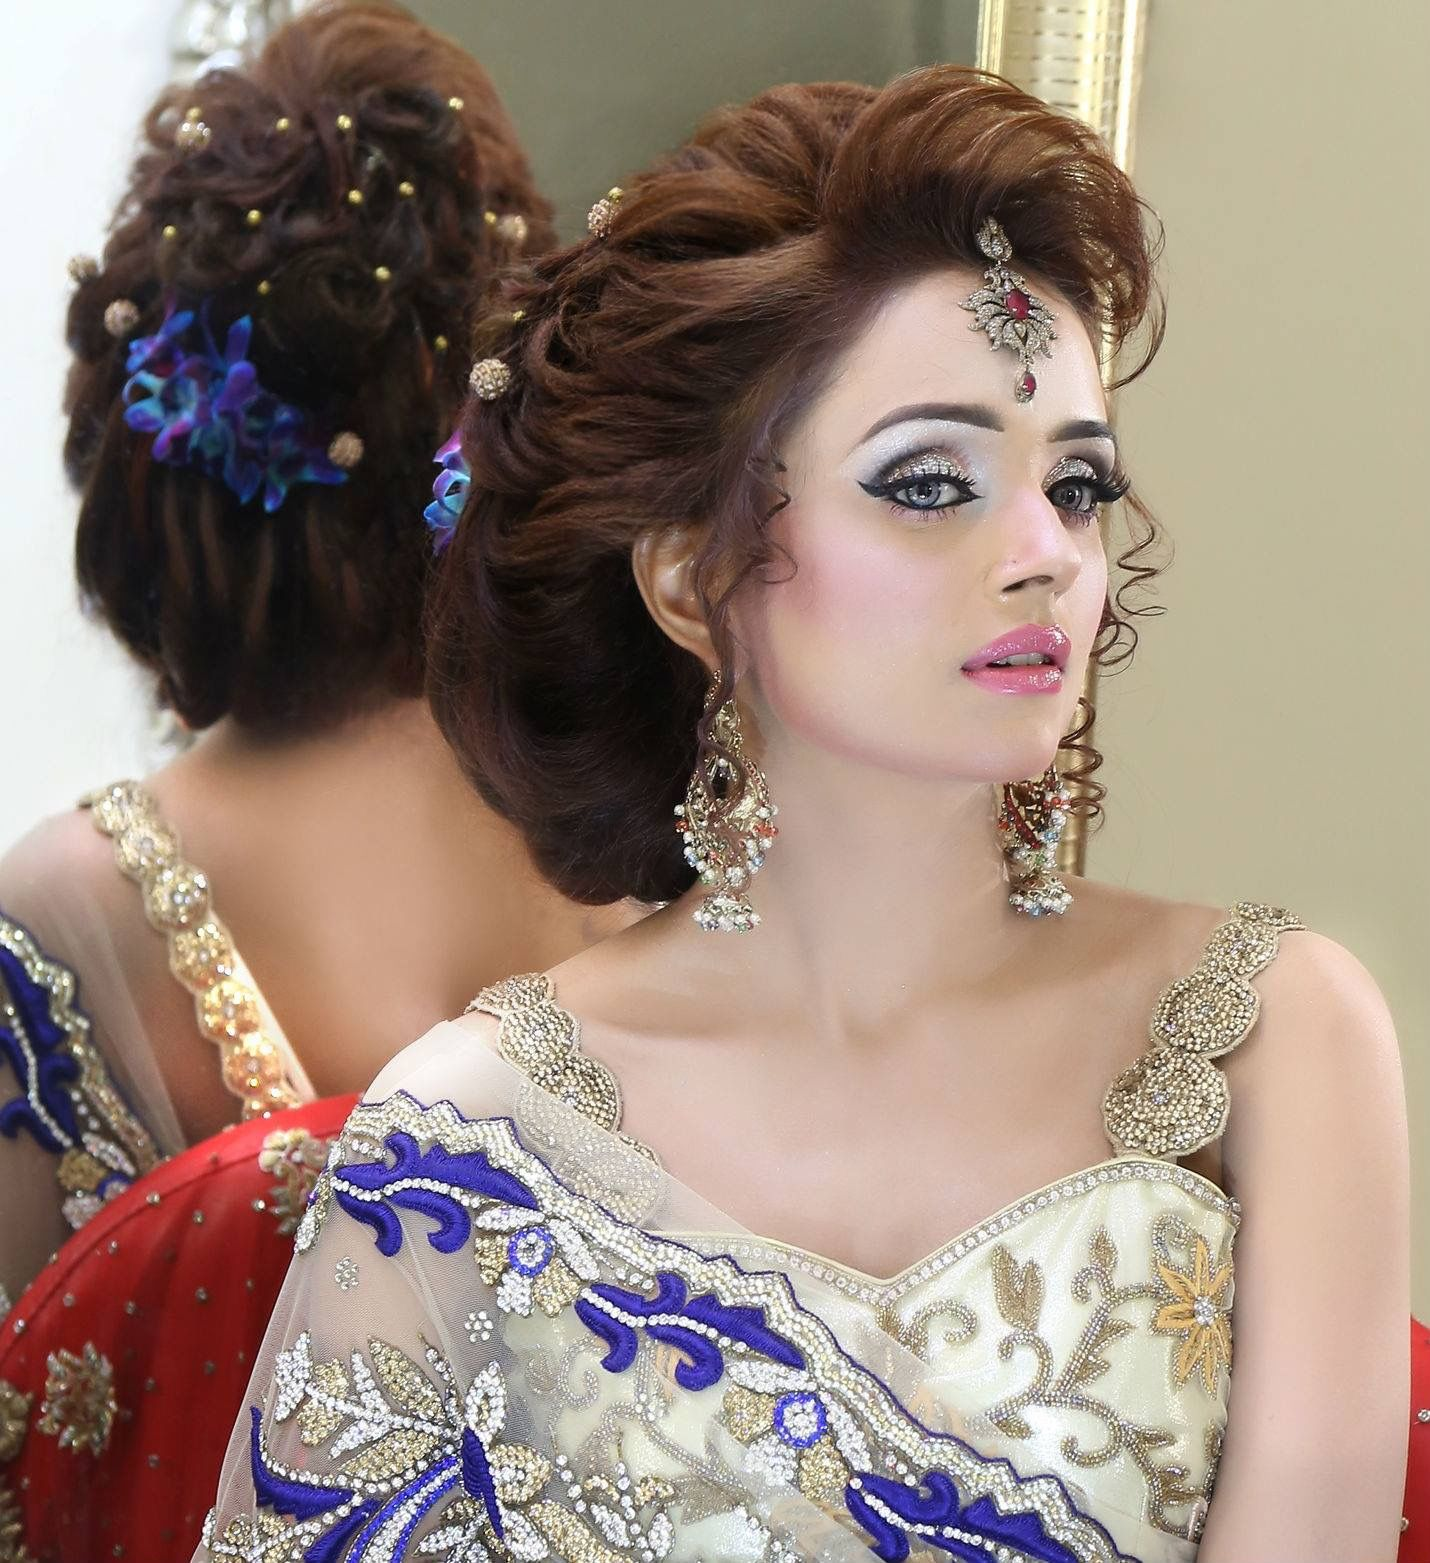 pin by esha ateeq 🇵🇰 on kashee's makeup expert. | pinterest